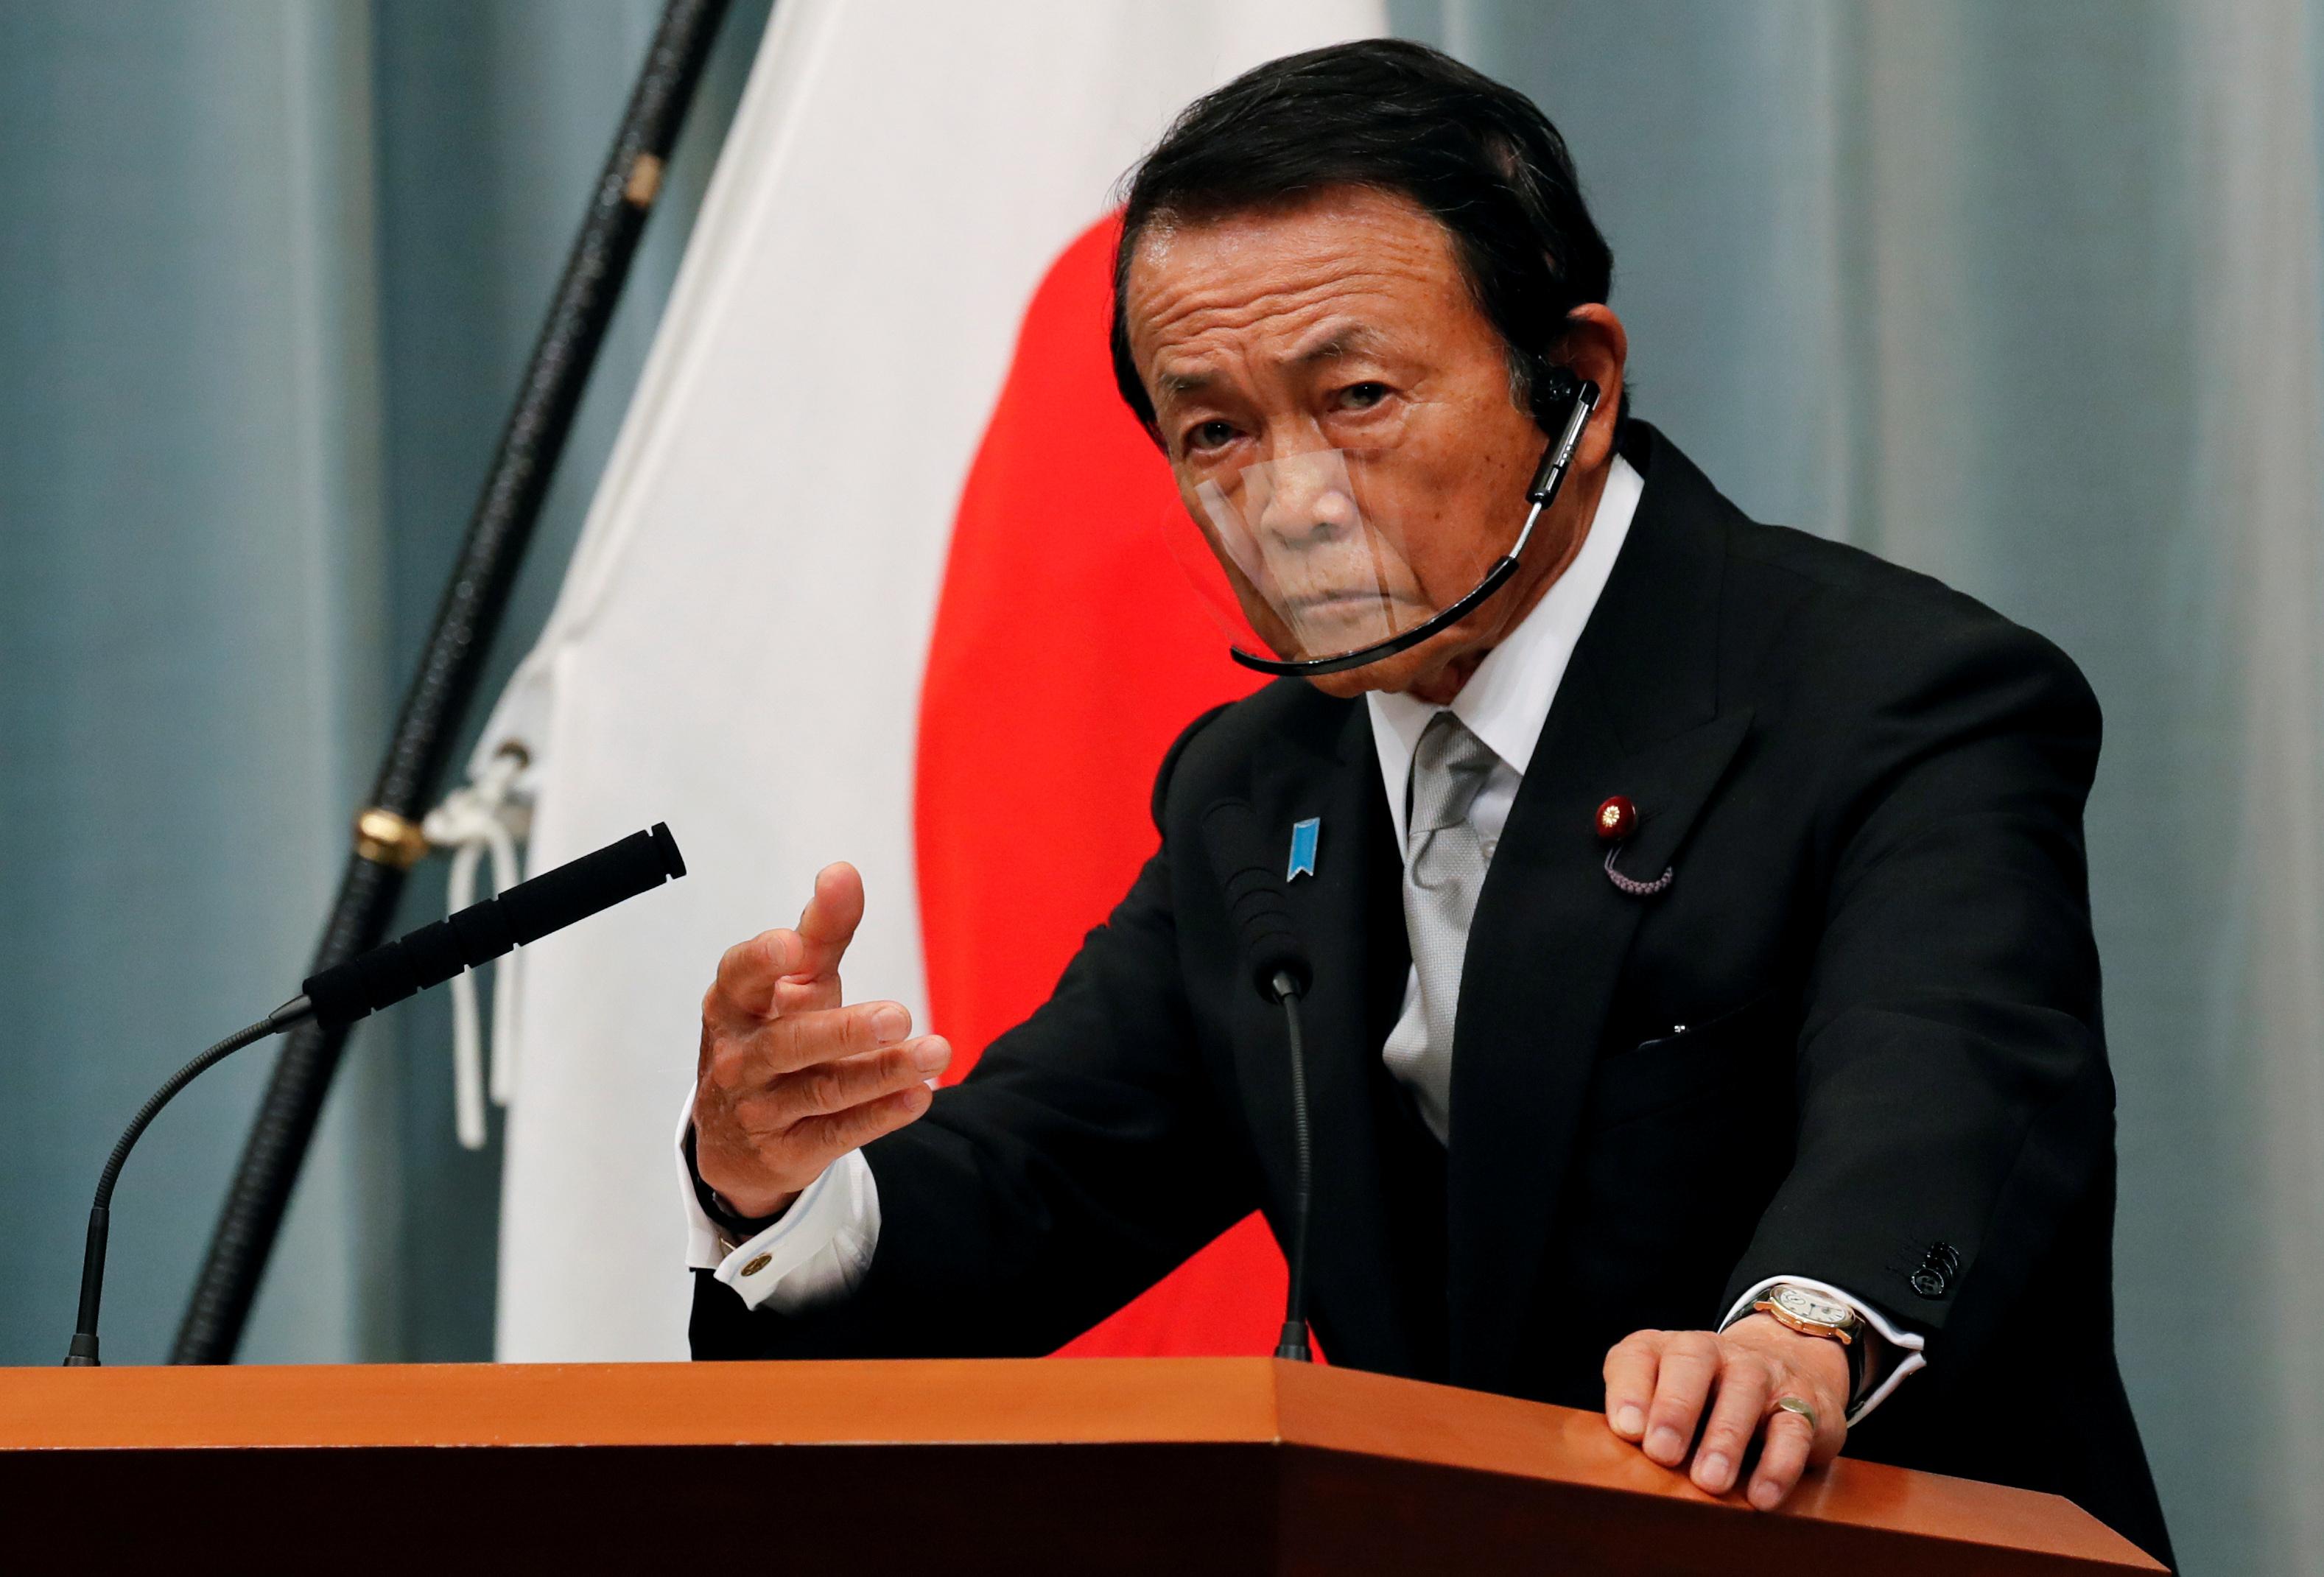 Deflation rears its ugly head again in Japan